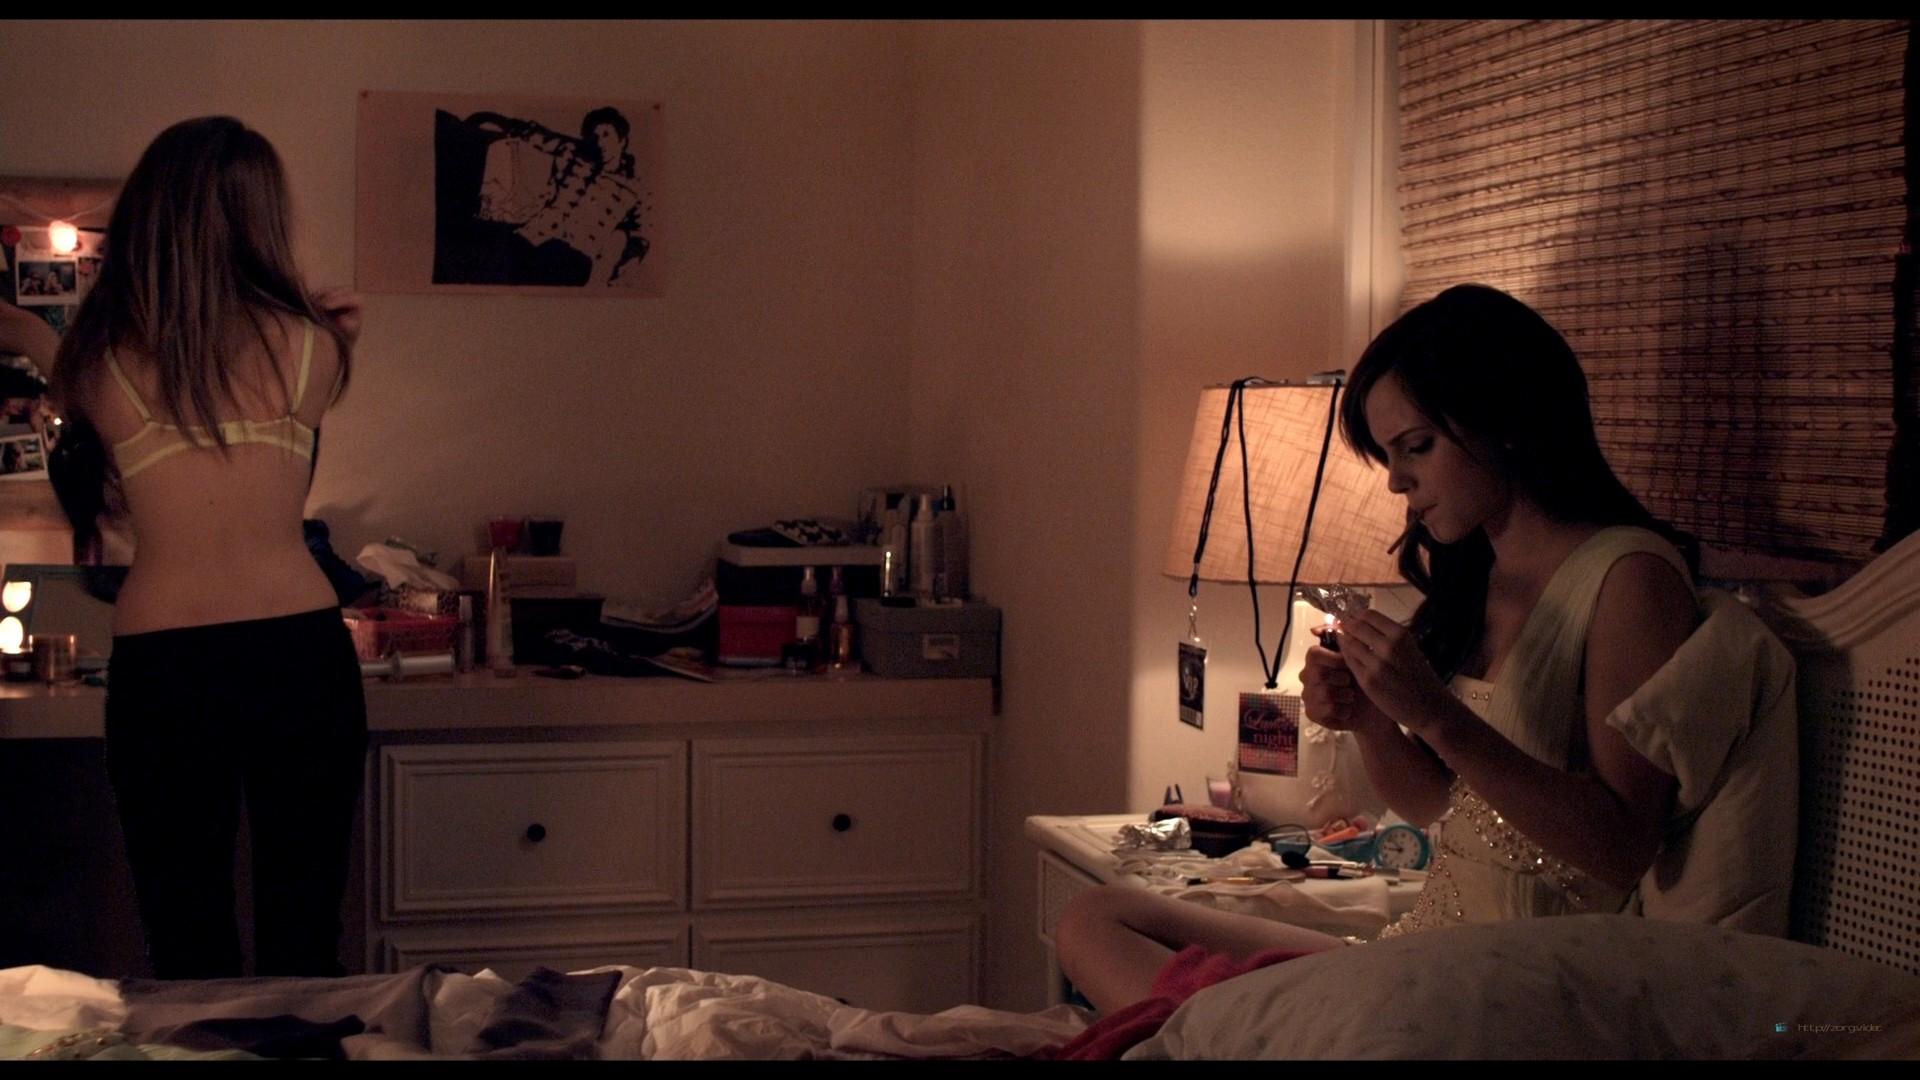 Emma Watson hot Taissa Farmiga and others sexy - The Bling Ring (2013) HD 1080p BluRay (6)